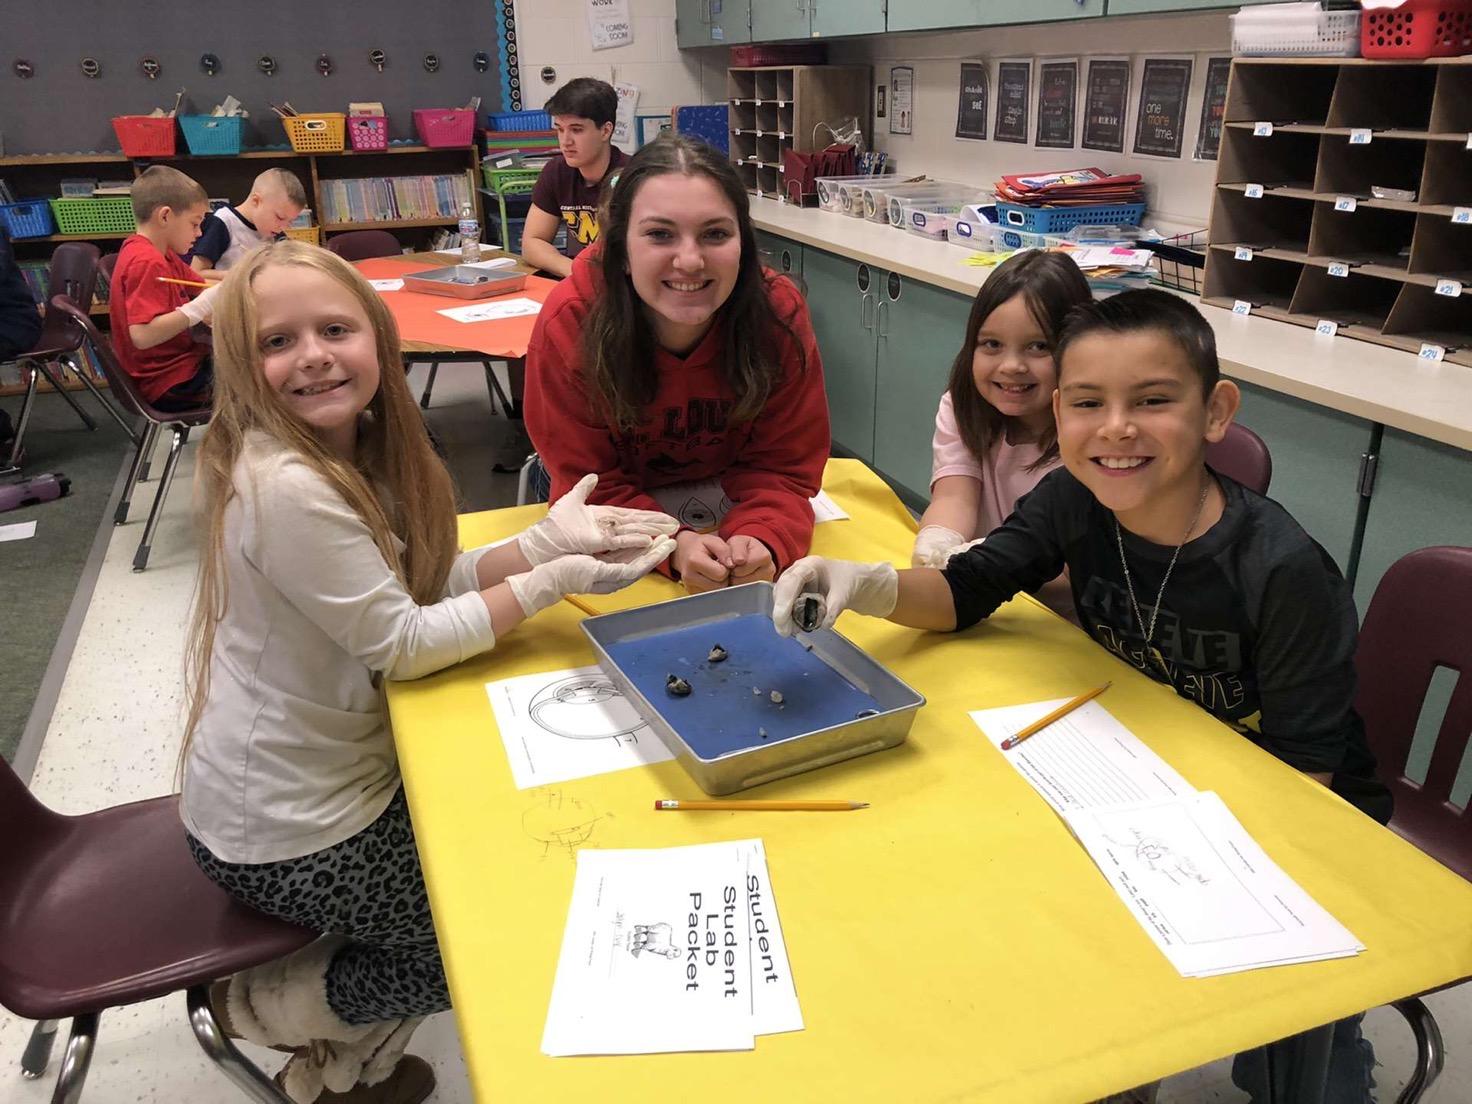 Senior Joslynn Clark enjoyed working with the second grade students.